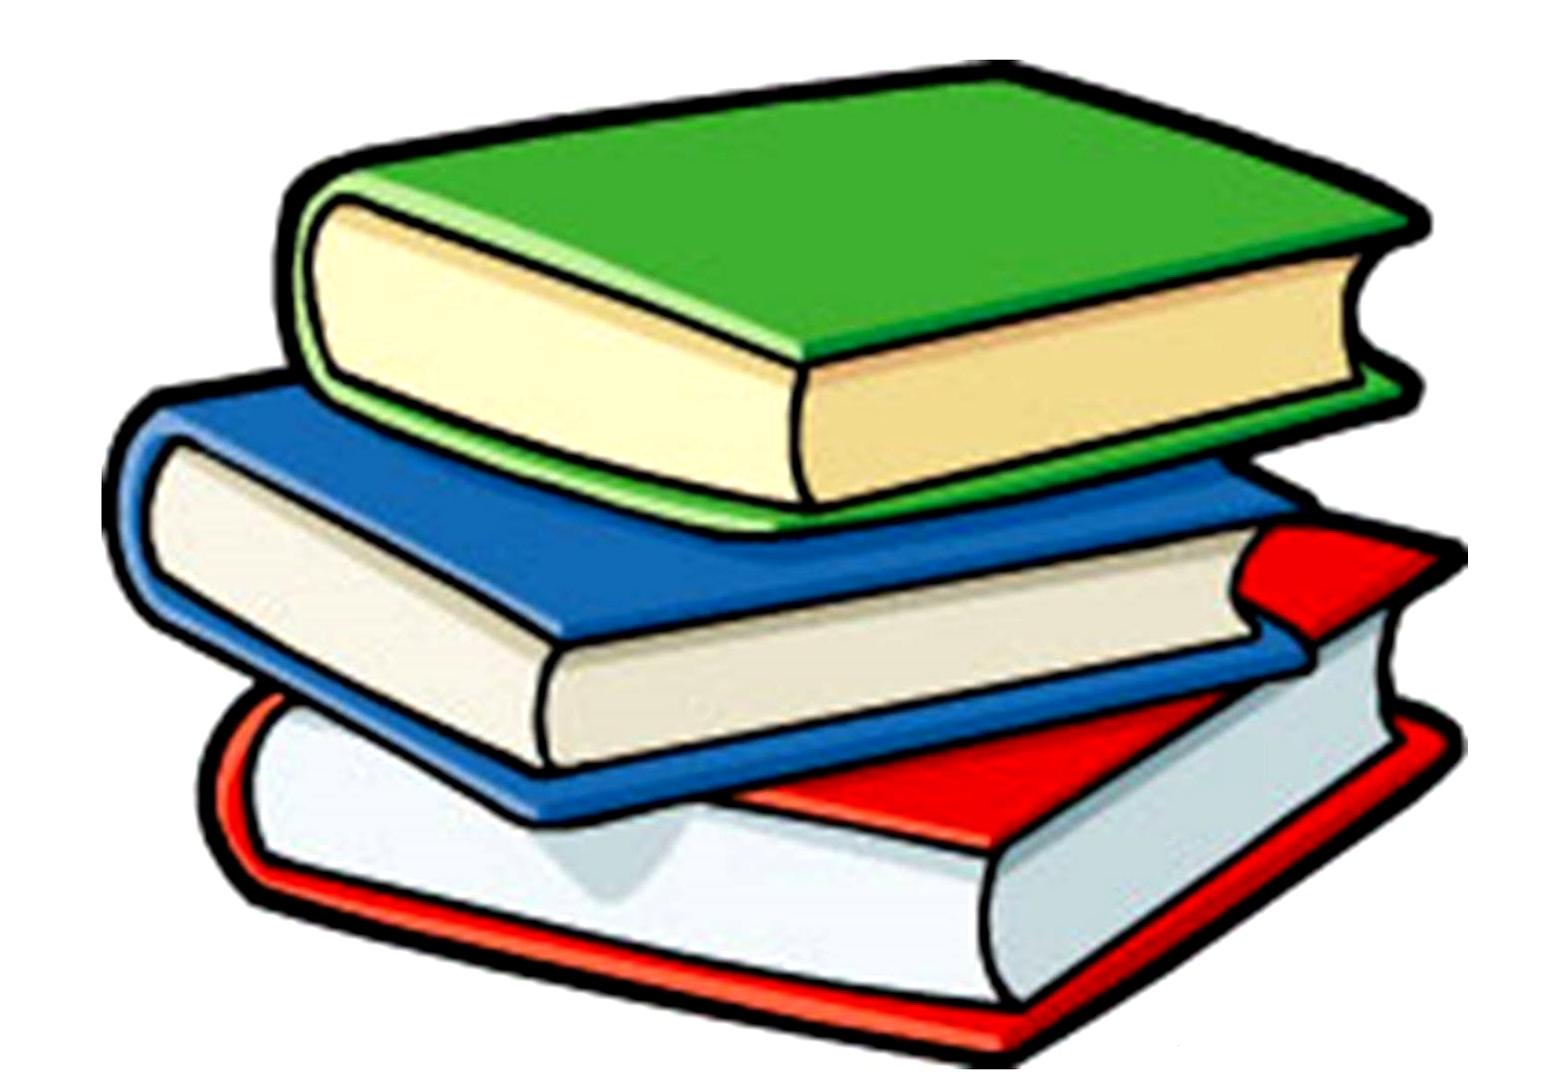 Iman S Home School Books Bid Ah Amp Deviant Sects